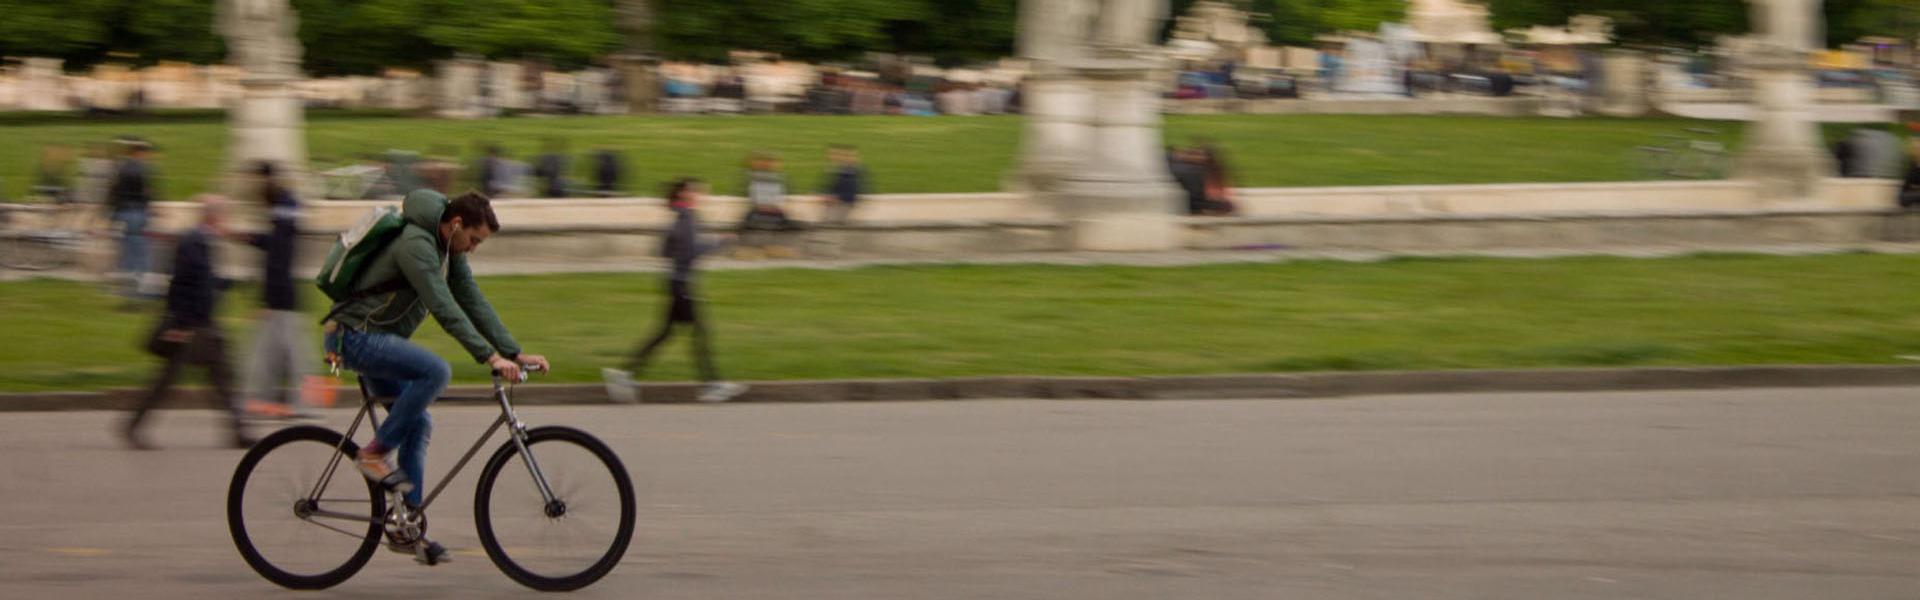 Padova Travel Bike ©Martina Pastrello